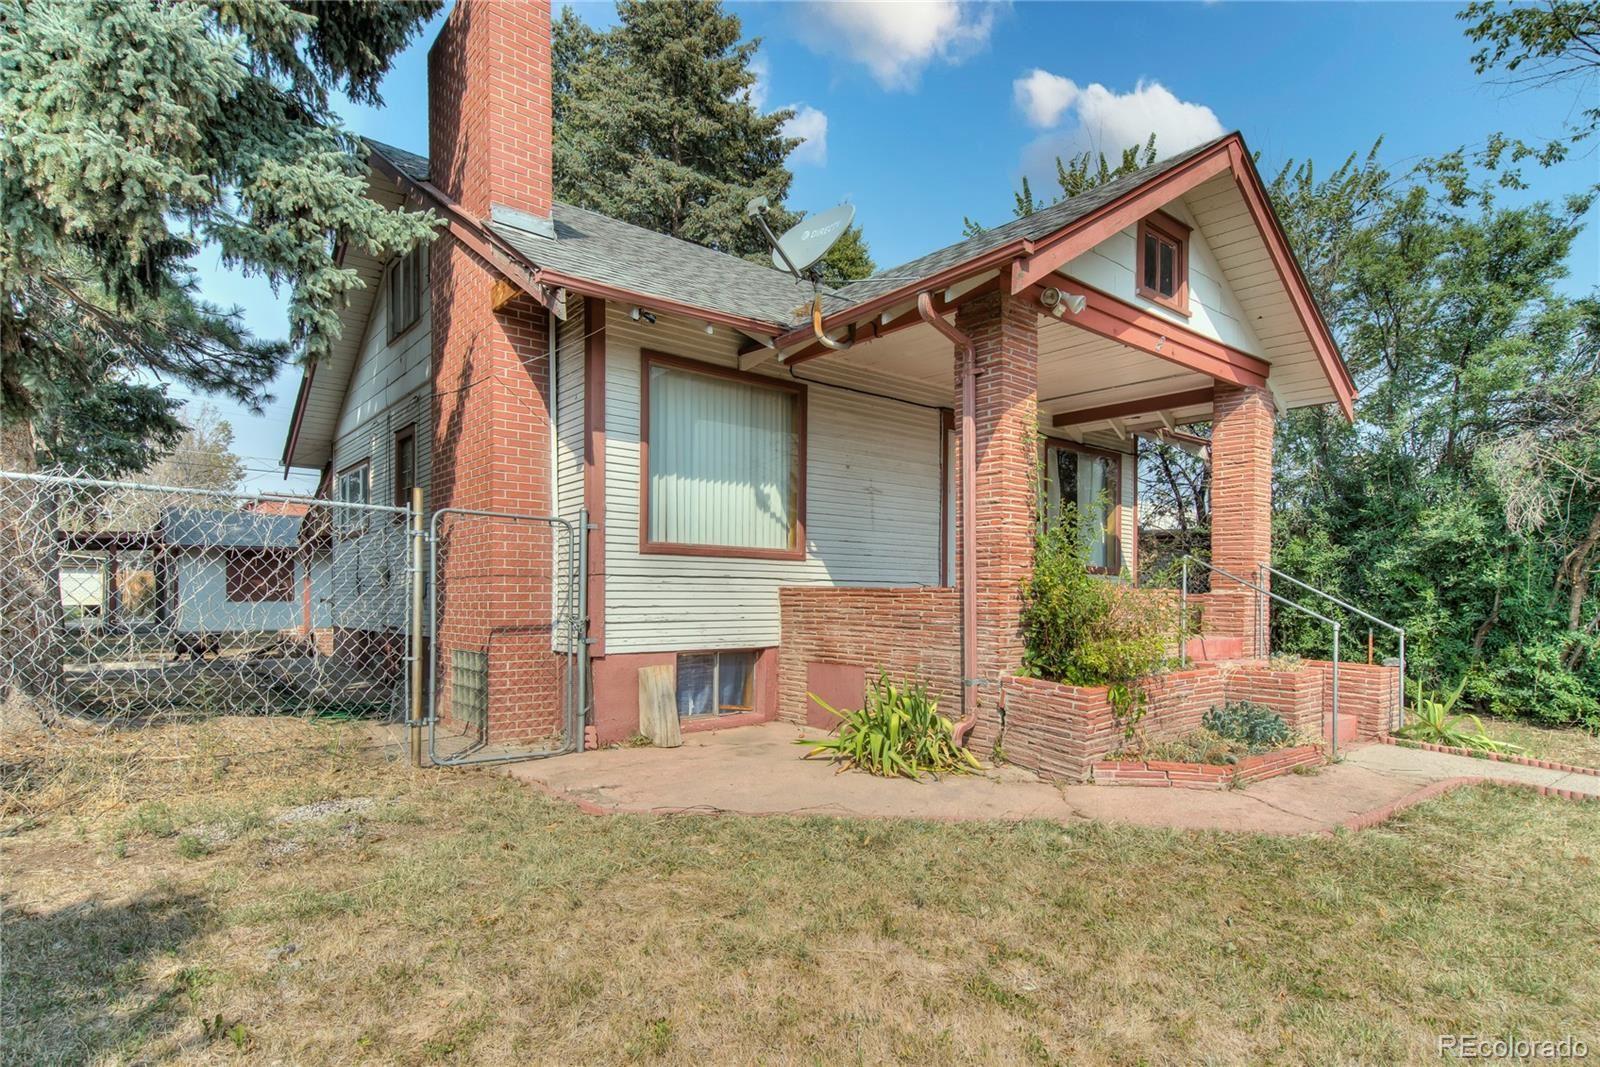 Photo of 1455 Verbena Street, Denver, CO 80220 (MLS # 7854678)